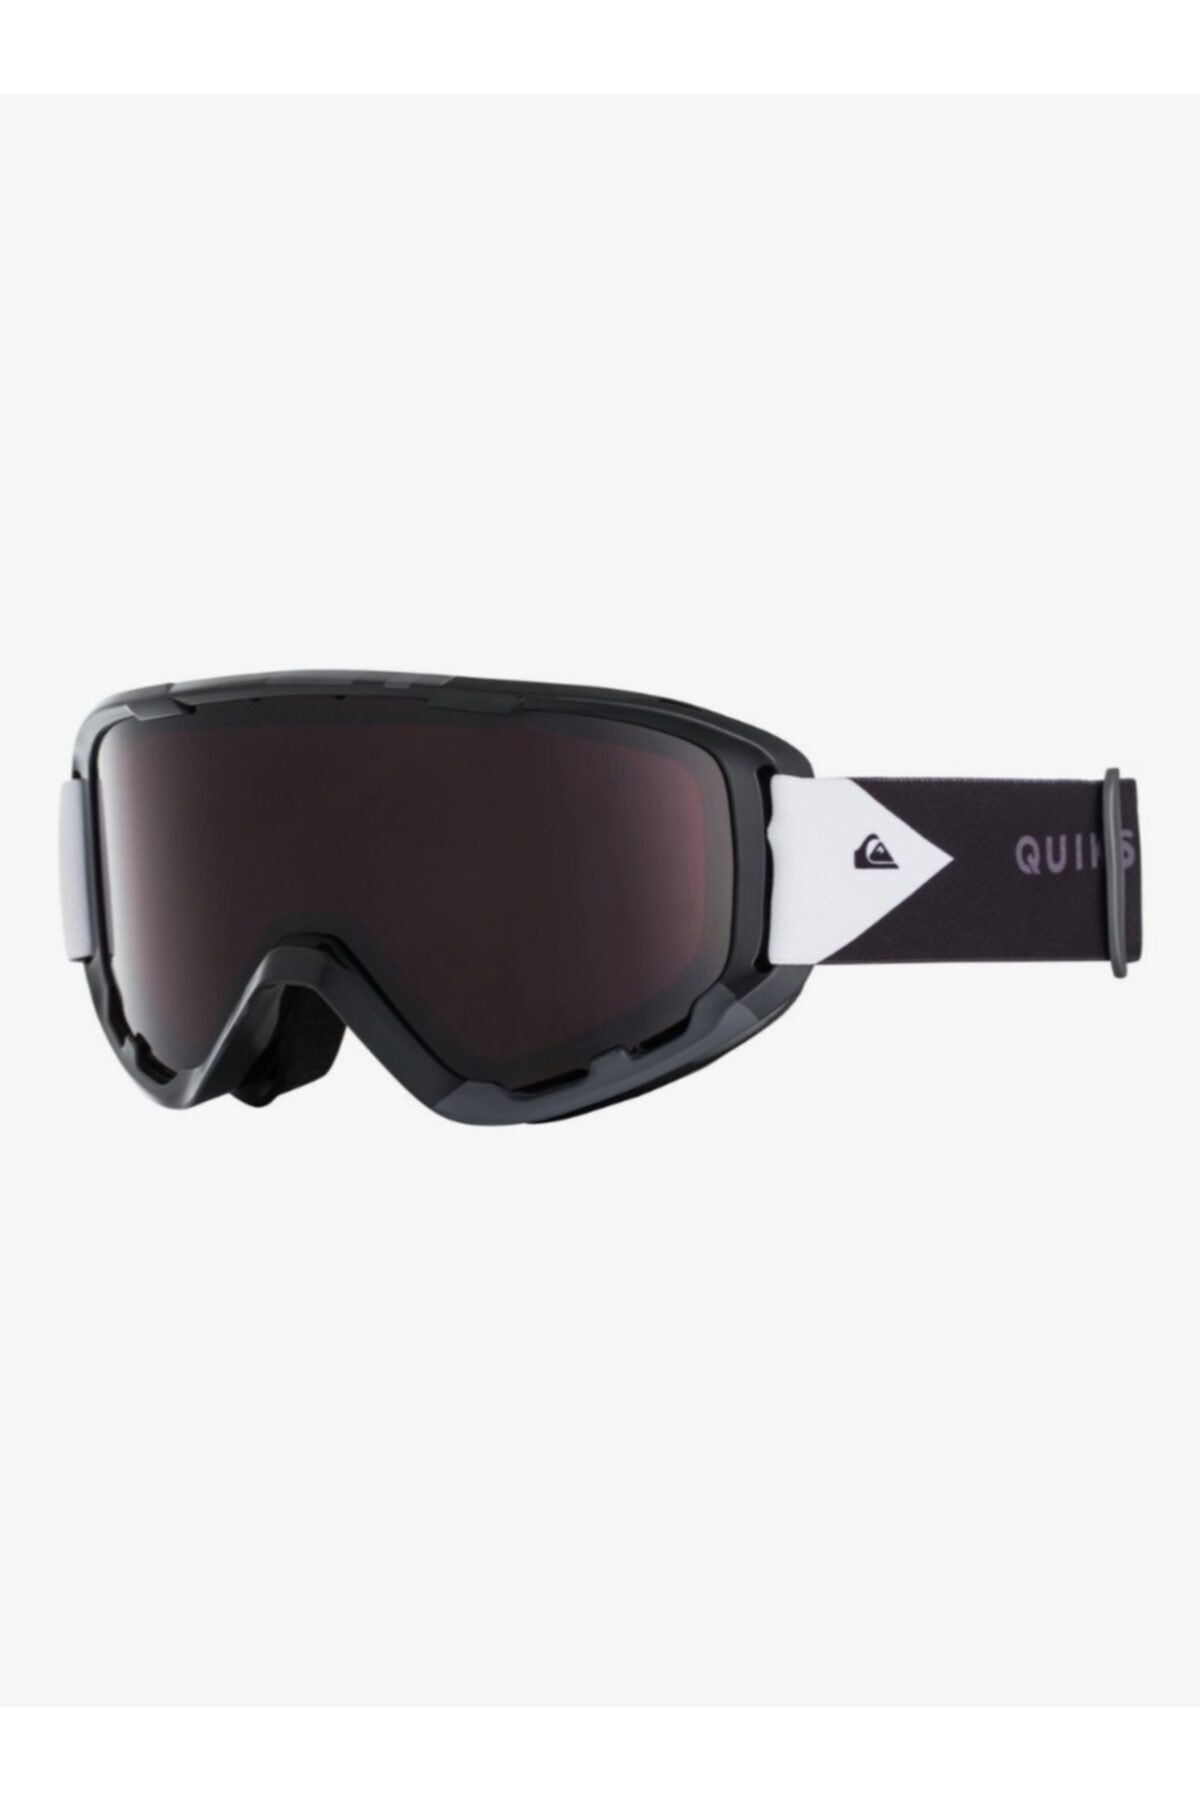 Quiksilver Unisex Siyah  Kayak Snowboard Gözlüğü Eqytg03101-kvj0 Sherpa M Sngg 1